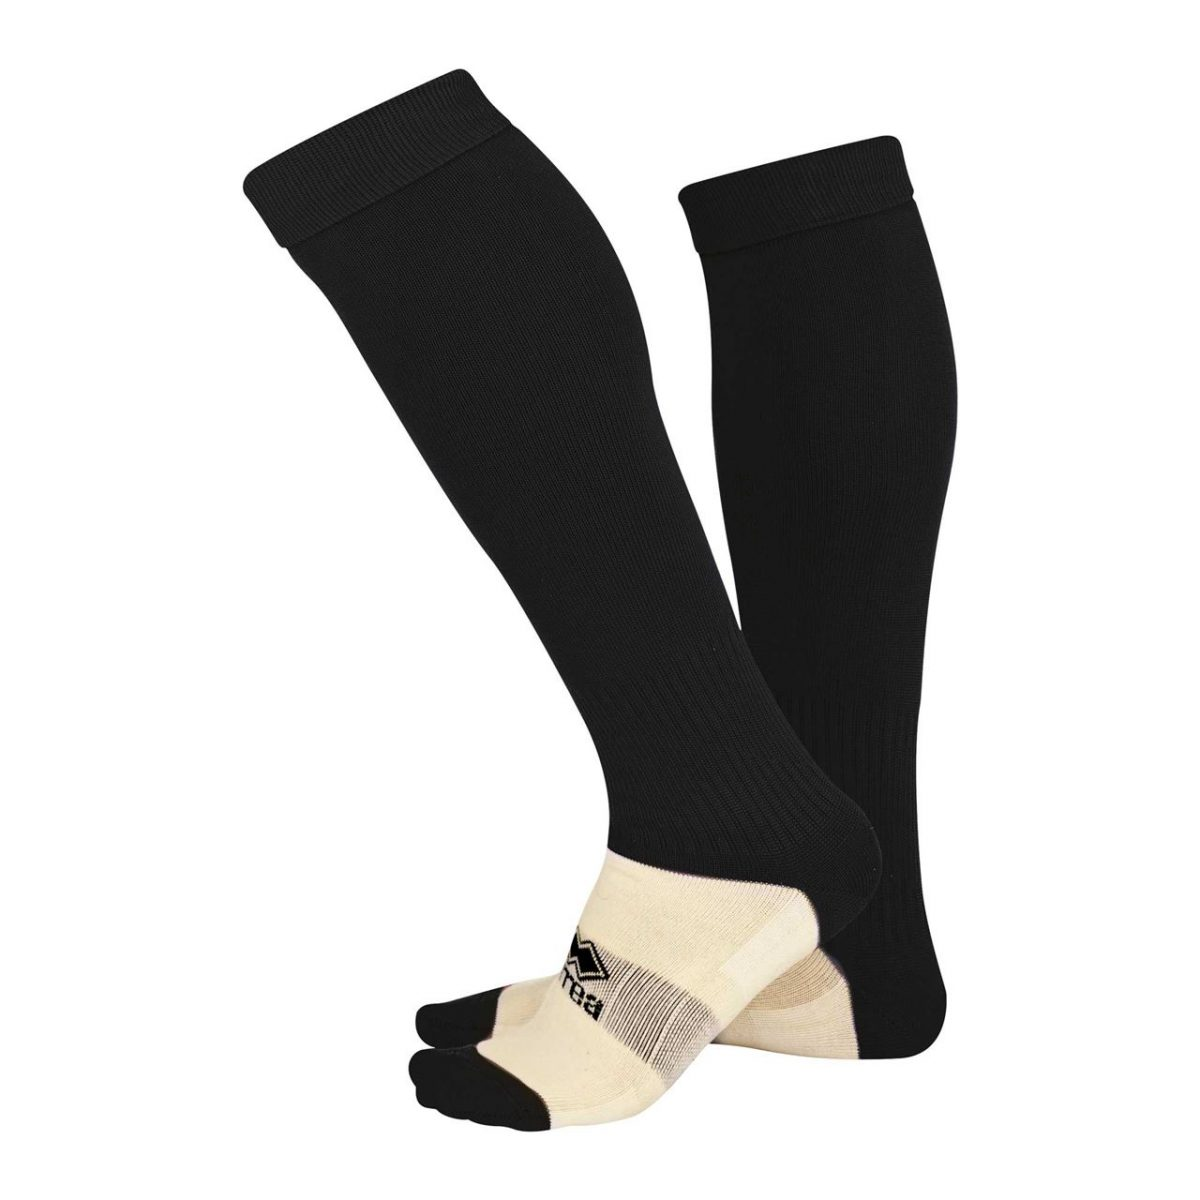 Newtown AFC Errea Polyestere Socks - Junior